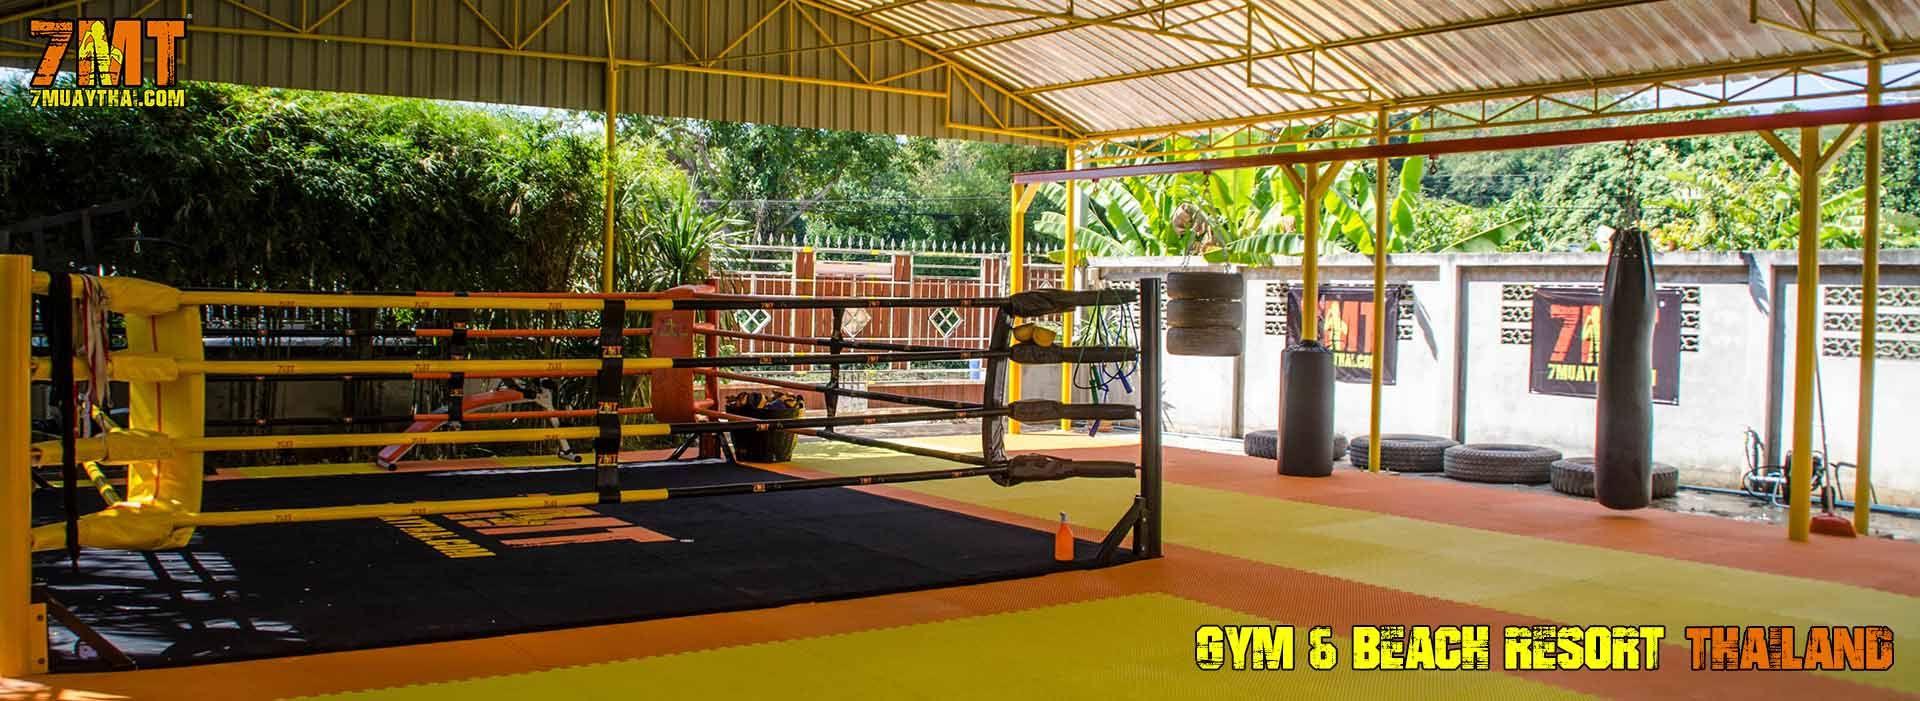 7 Muay Thai Gym Beach Resort In 2020 Muay Thai Gym Muay Thai Training Muay Thai